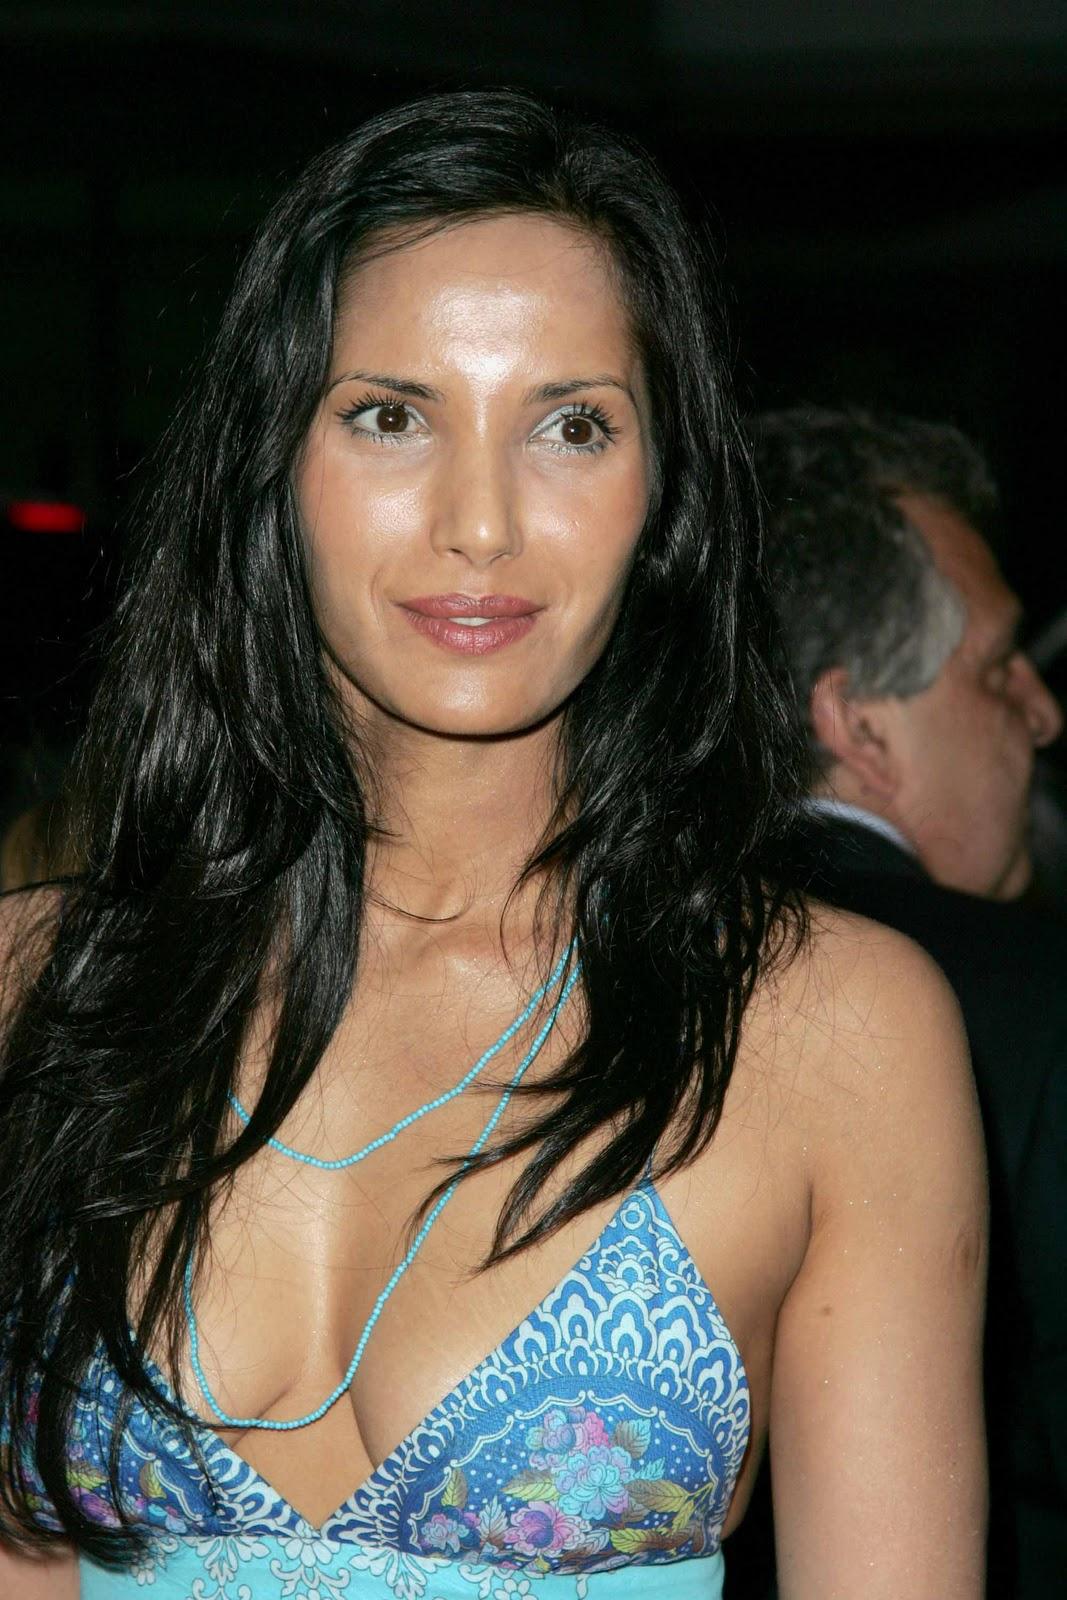 Hot ICloud Padma Lakshmi naked photo 2017